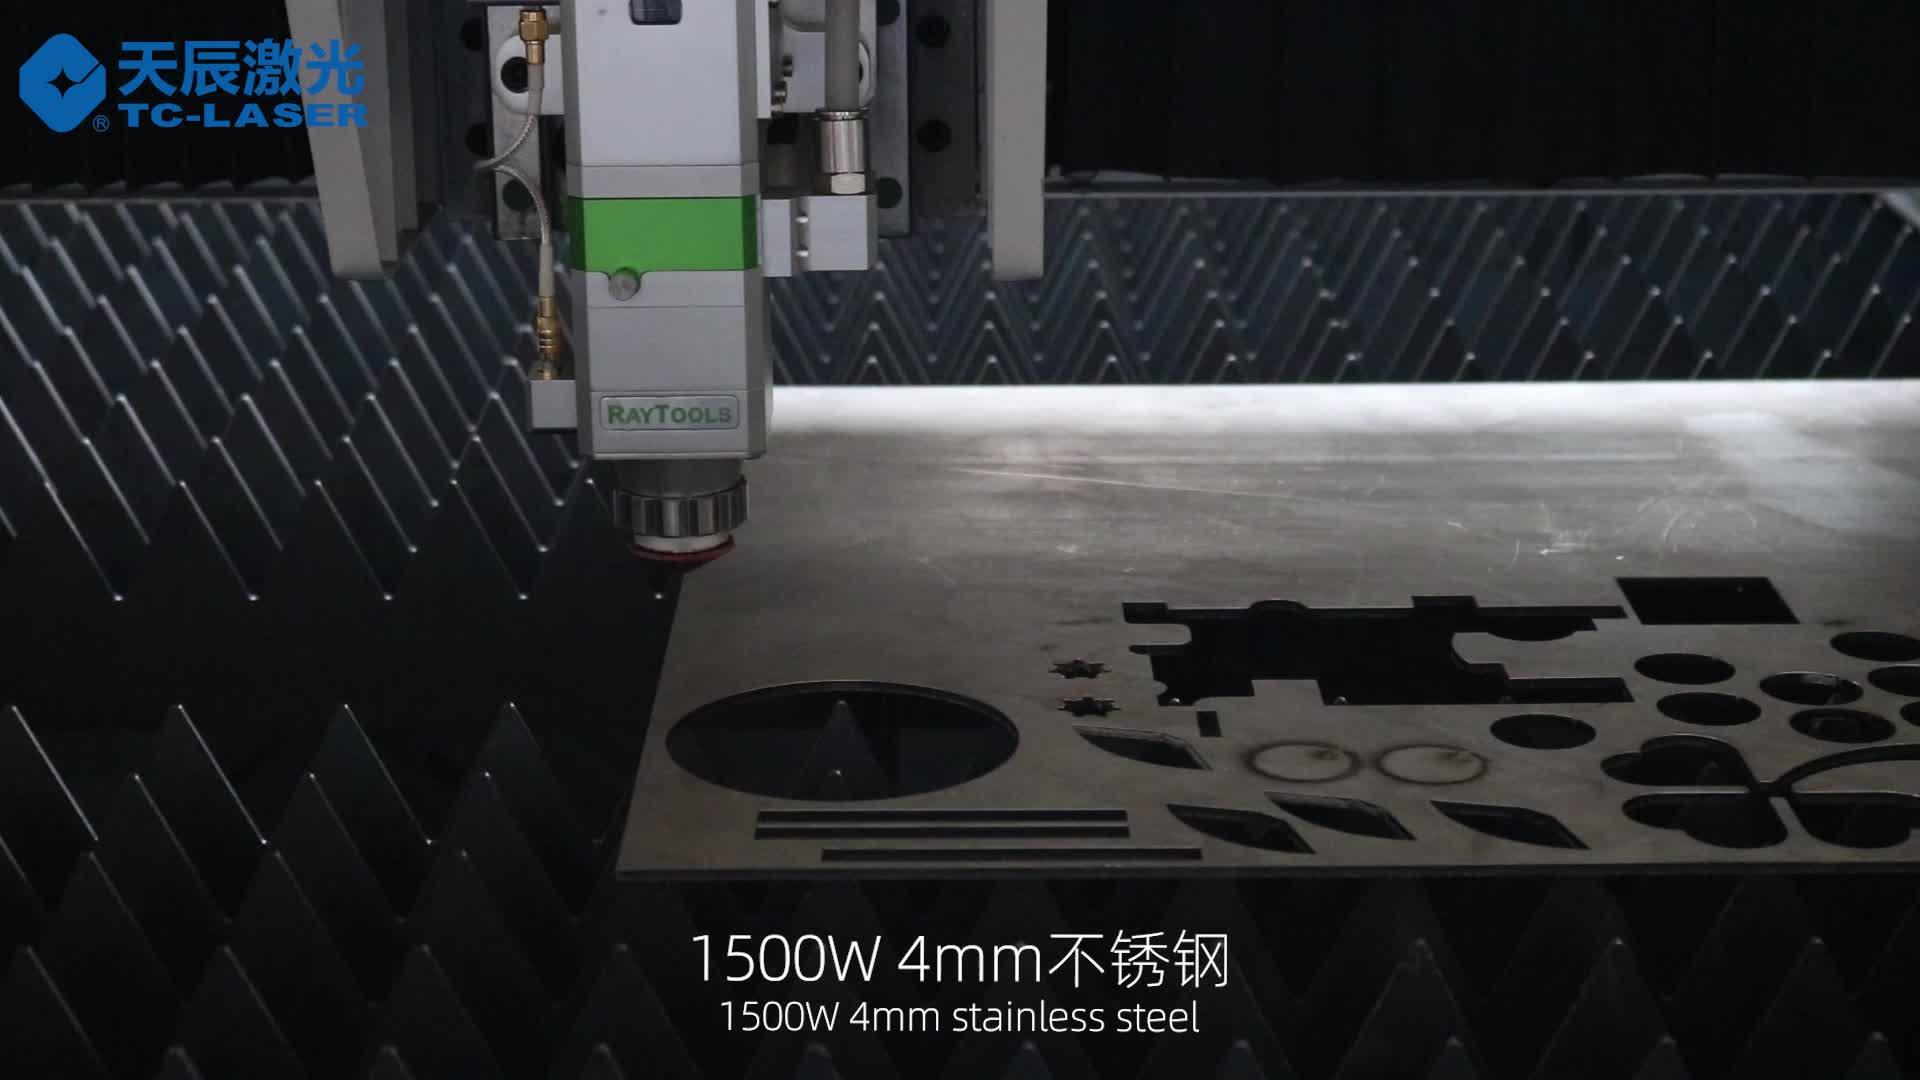 Endüstriyel kesici ekipmanları 1530 CNC makinesi pirinç sac demir metal fiber lazer kesim